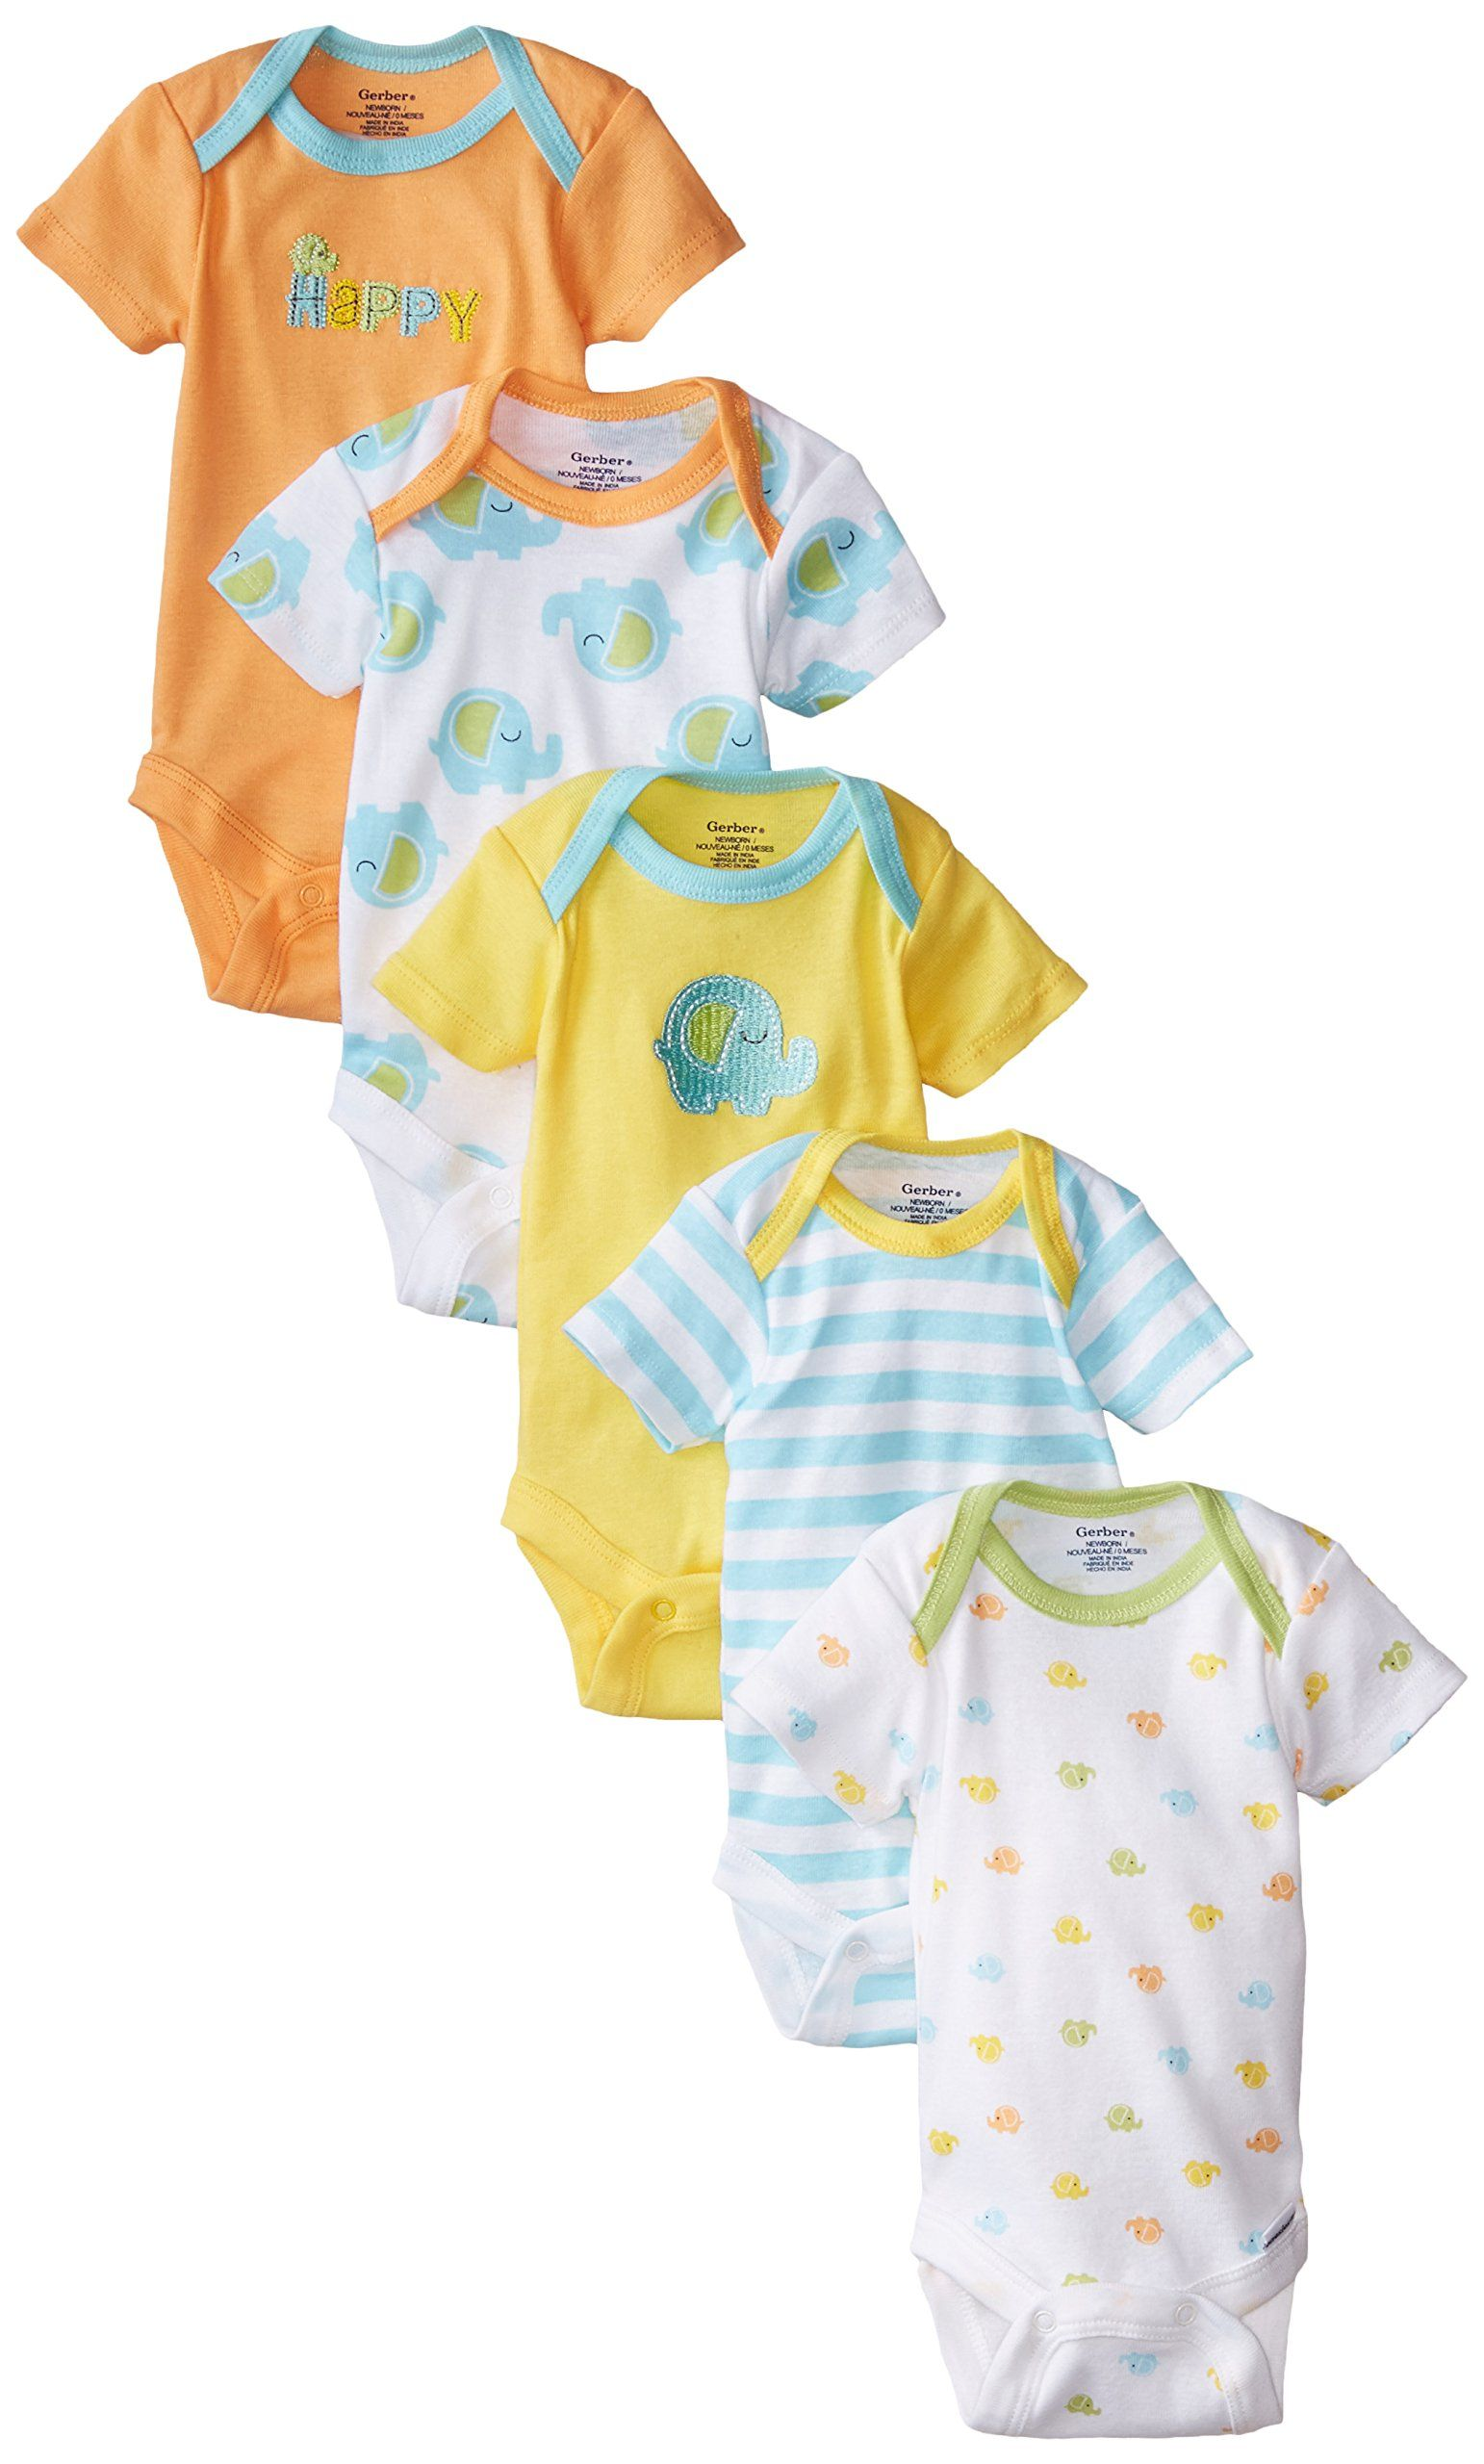 32f7f2a391ed2 Amazon.com: Gerber Unisex-Baby Newborn Five-Pack Variety Onesie ...